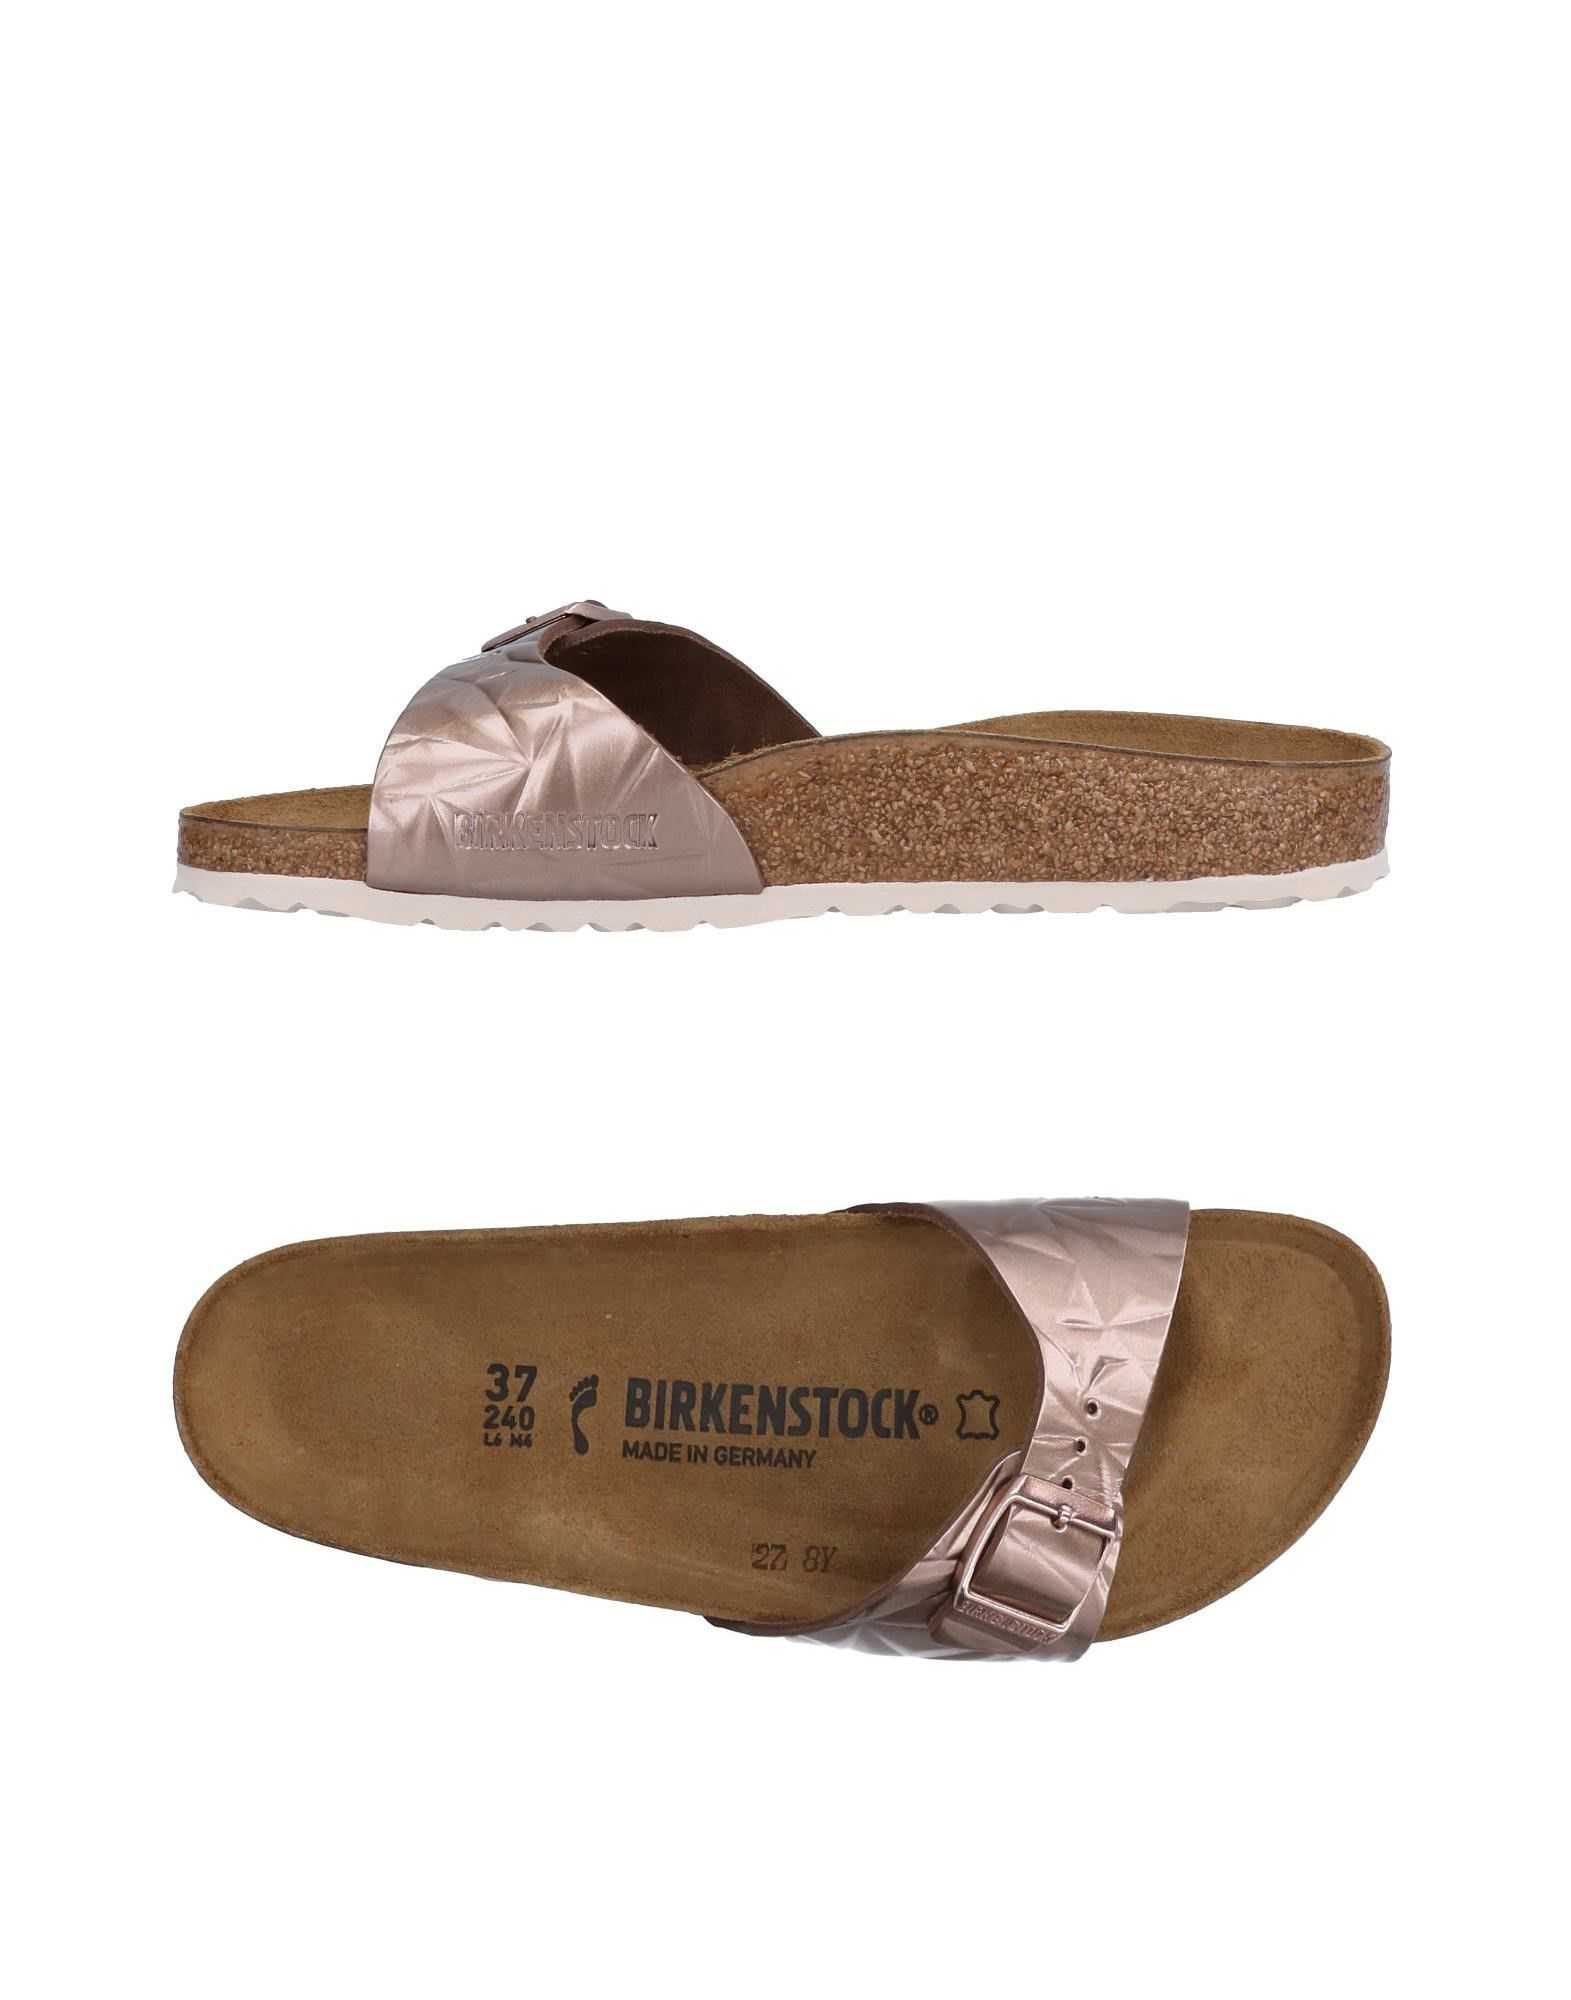 Birkenstock Sandalen Damen  11507664NL Gute Qualität beliebte Schuhe